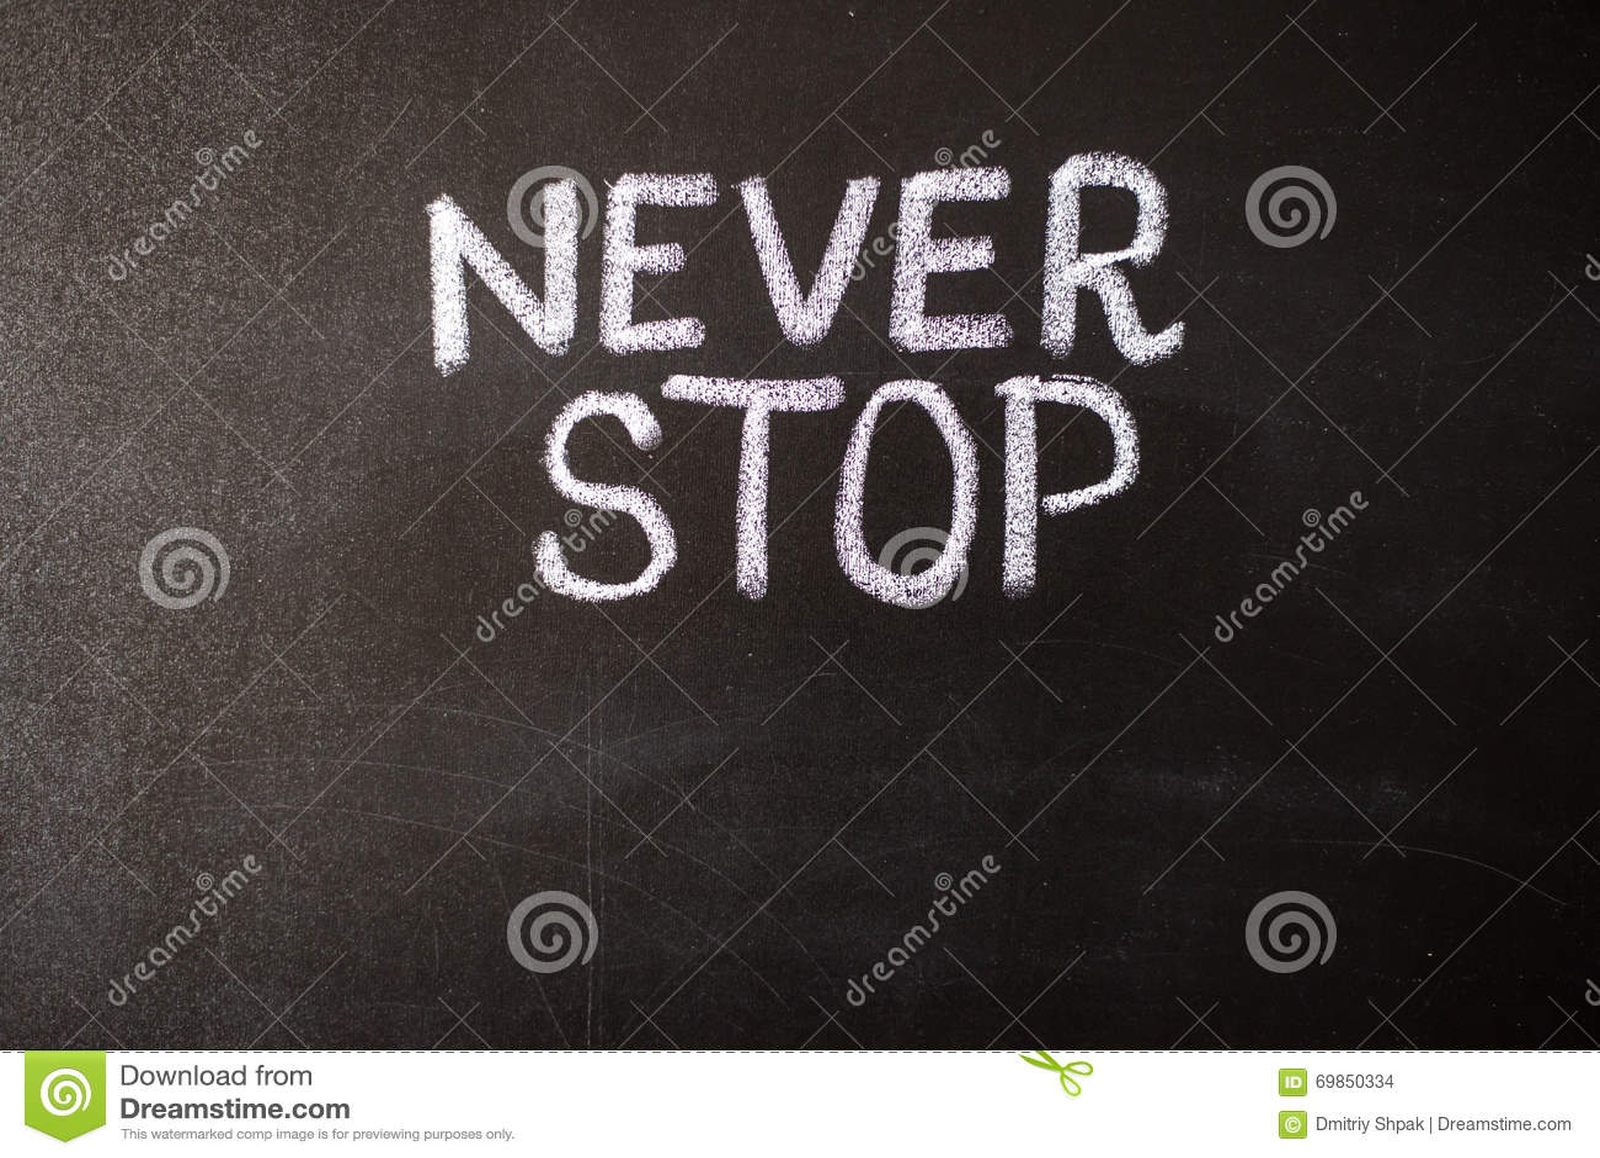 Motivational Words Never Stop Business Or School Motivational Wordsstock Photo